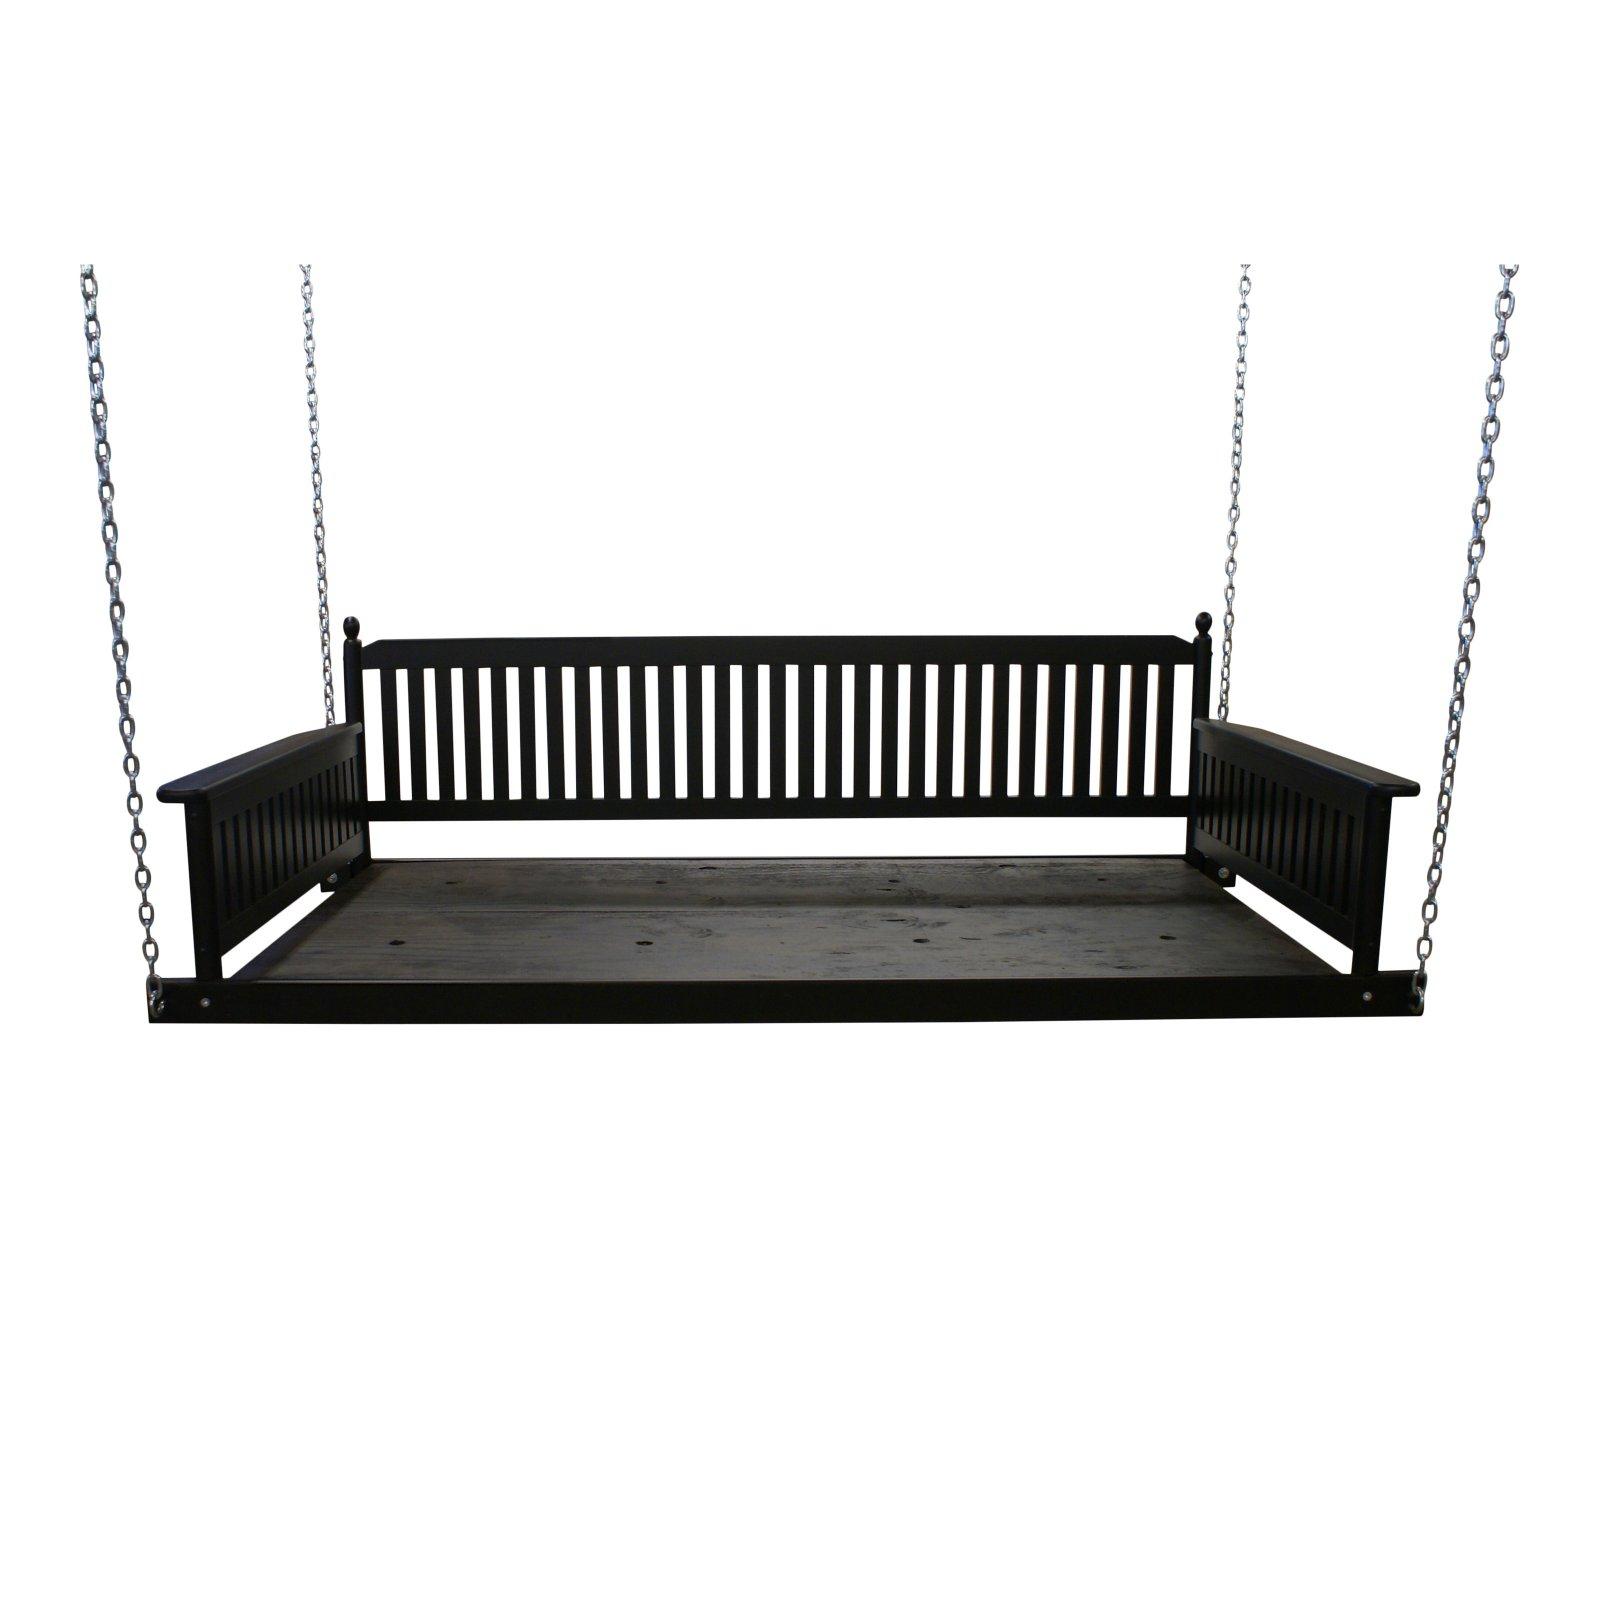 Hinkle Bradley 256 Wood Patio Day Bed Swing (View 16 of 30)